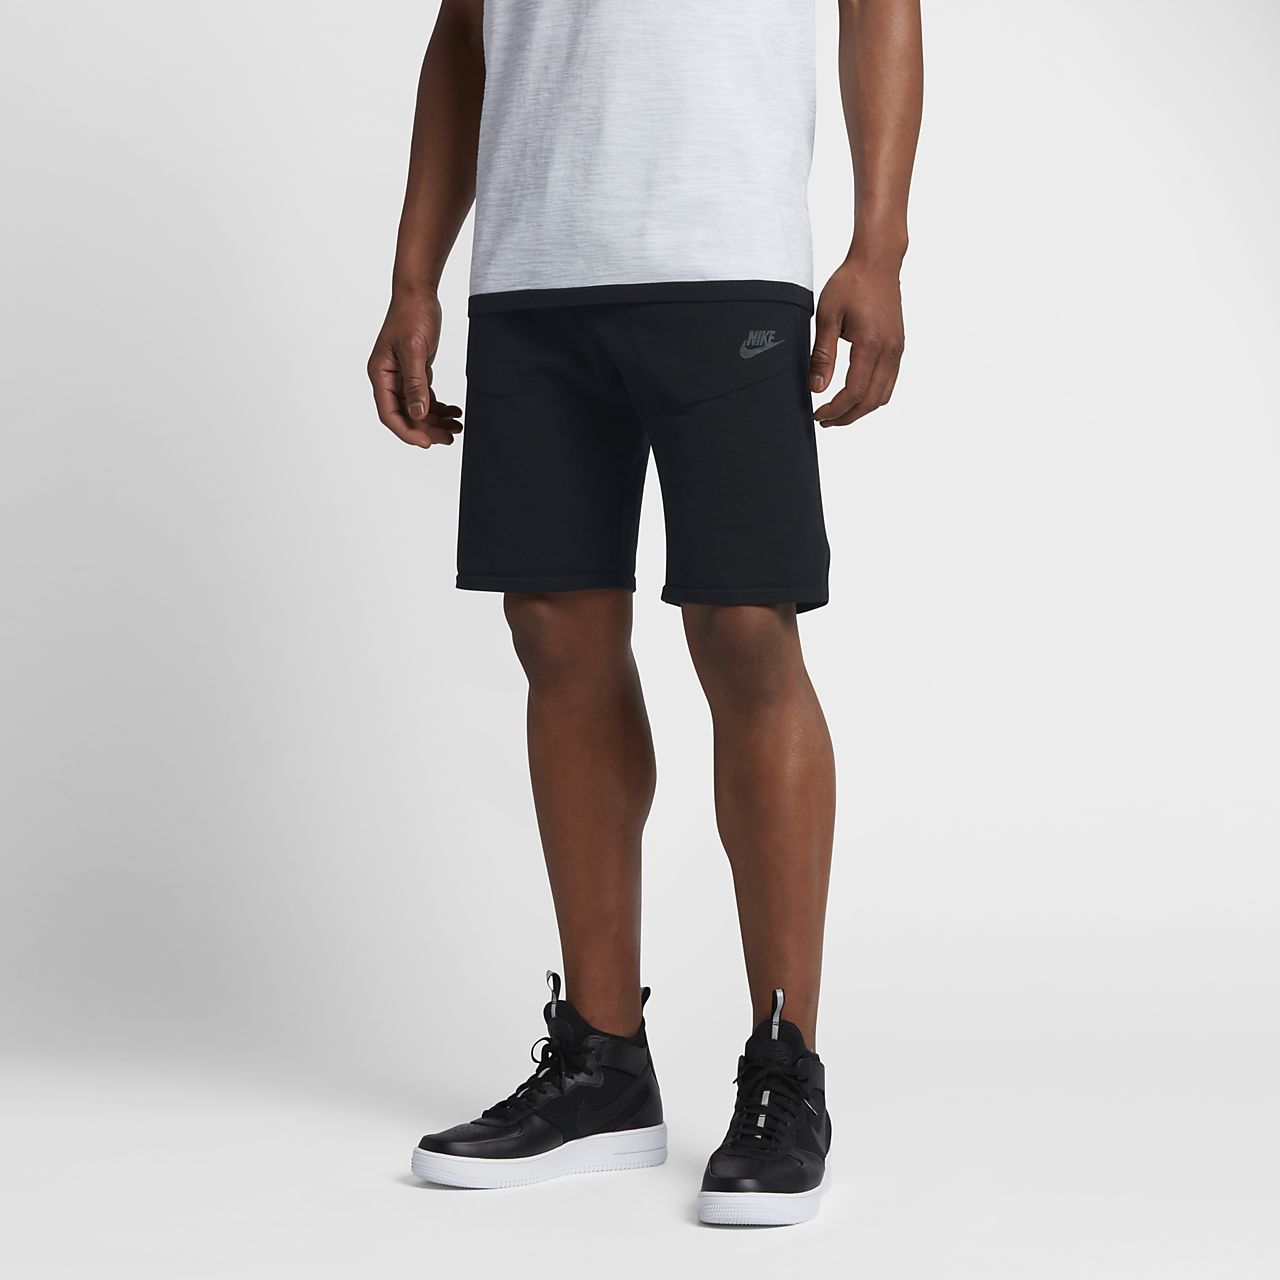 8012e692b8 Nike Sportswear Tech Knit Men's Shorts